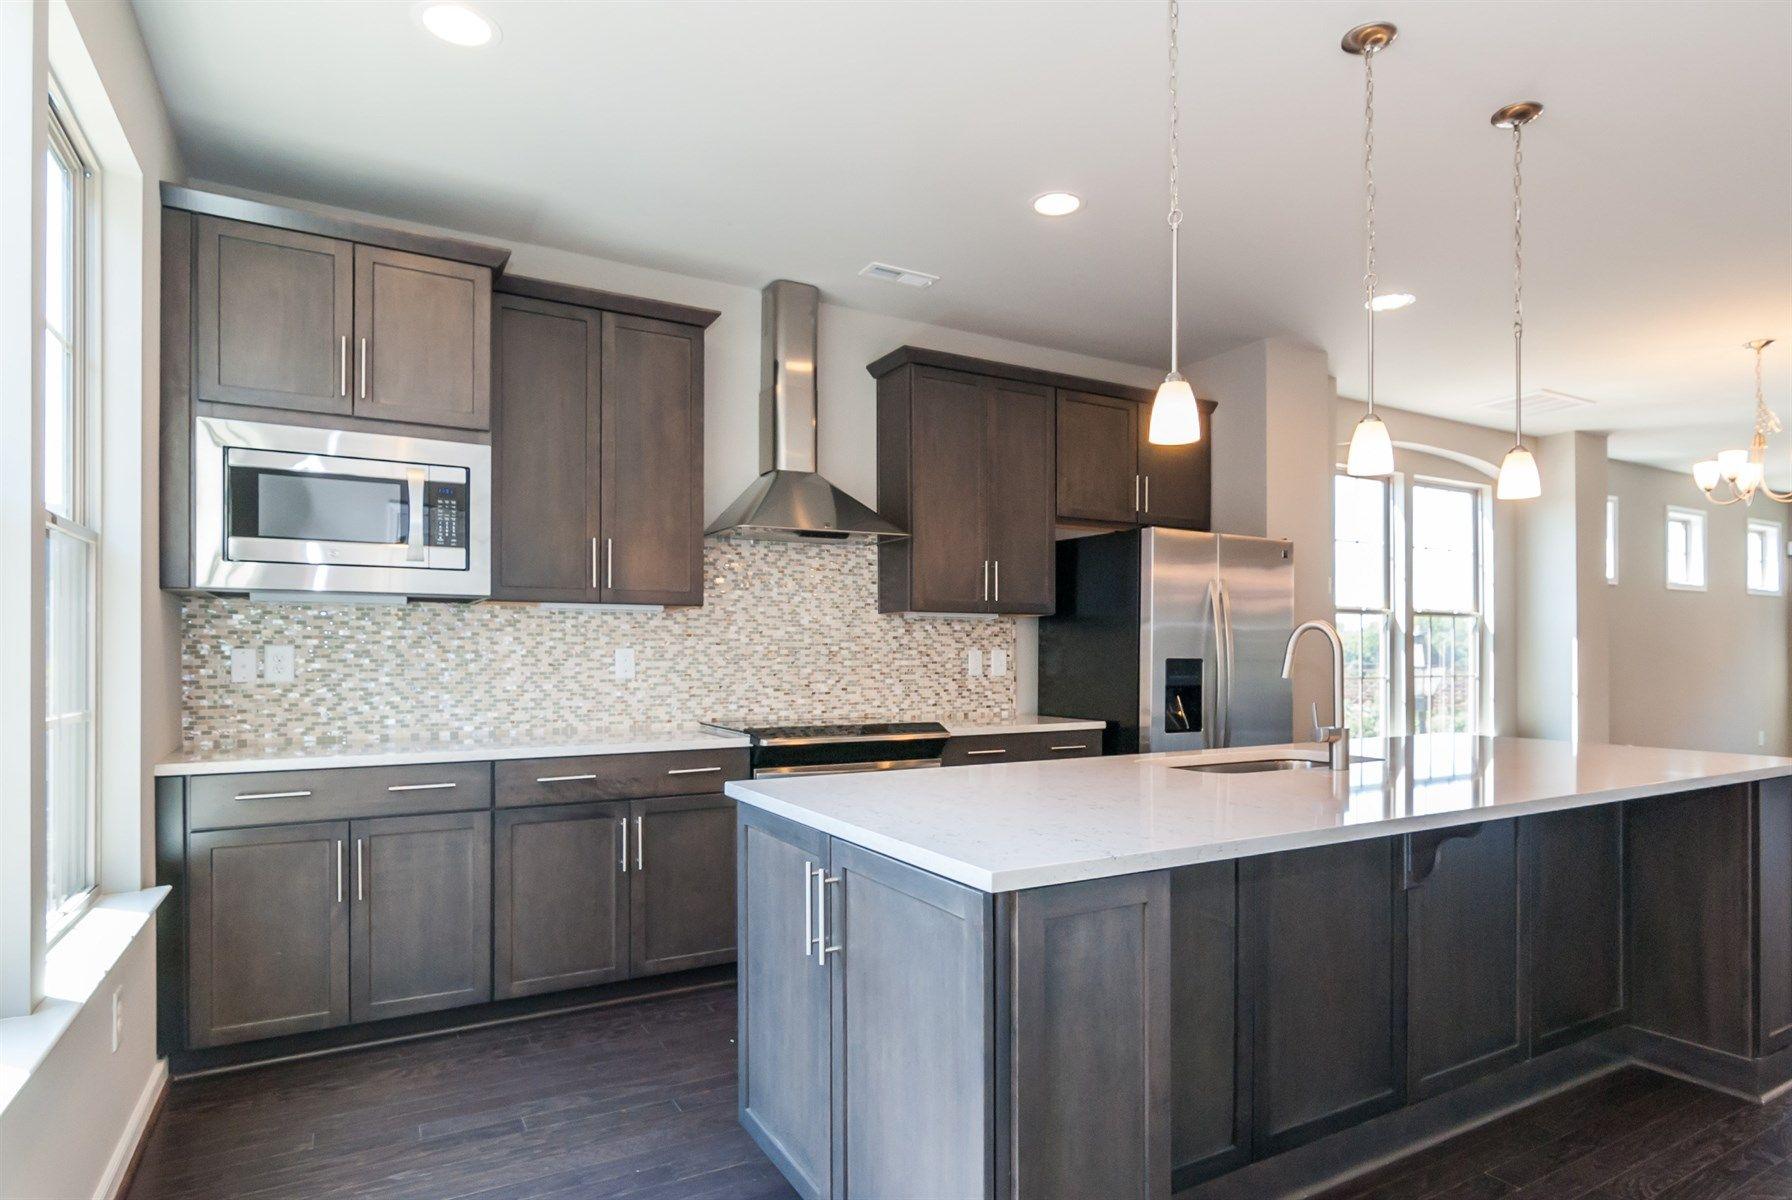 HHHunt Homes Drake floorplan at Rocketts Landing in Richmond, VA ...